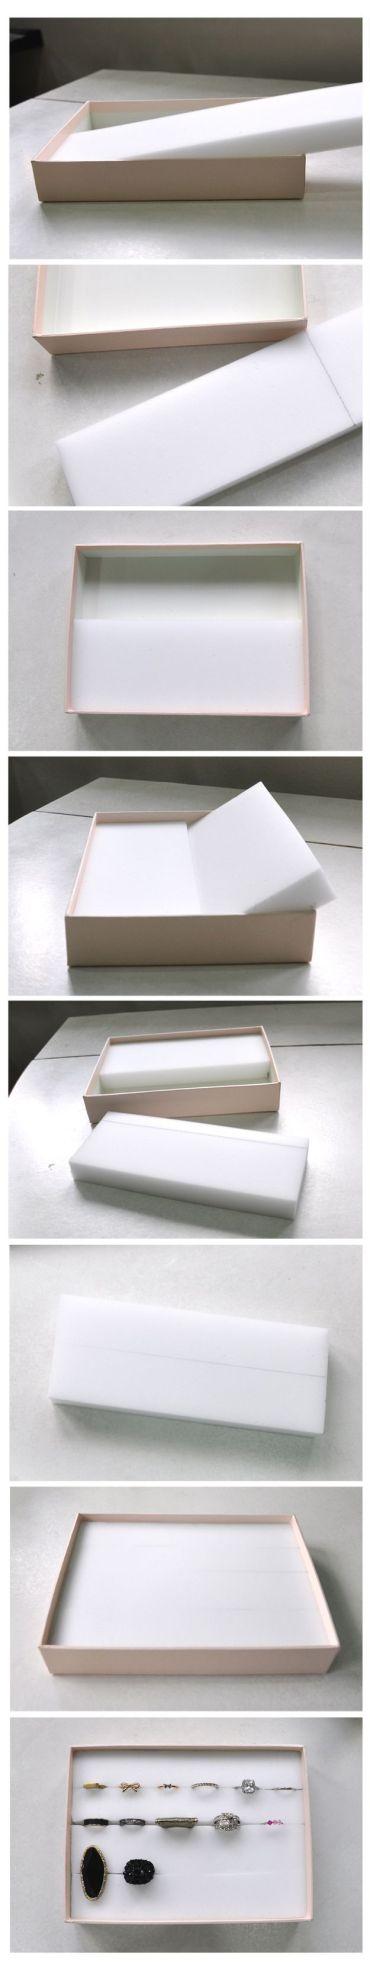 Reusing match boxes   ecogreenlove